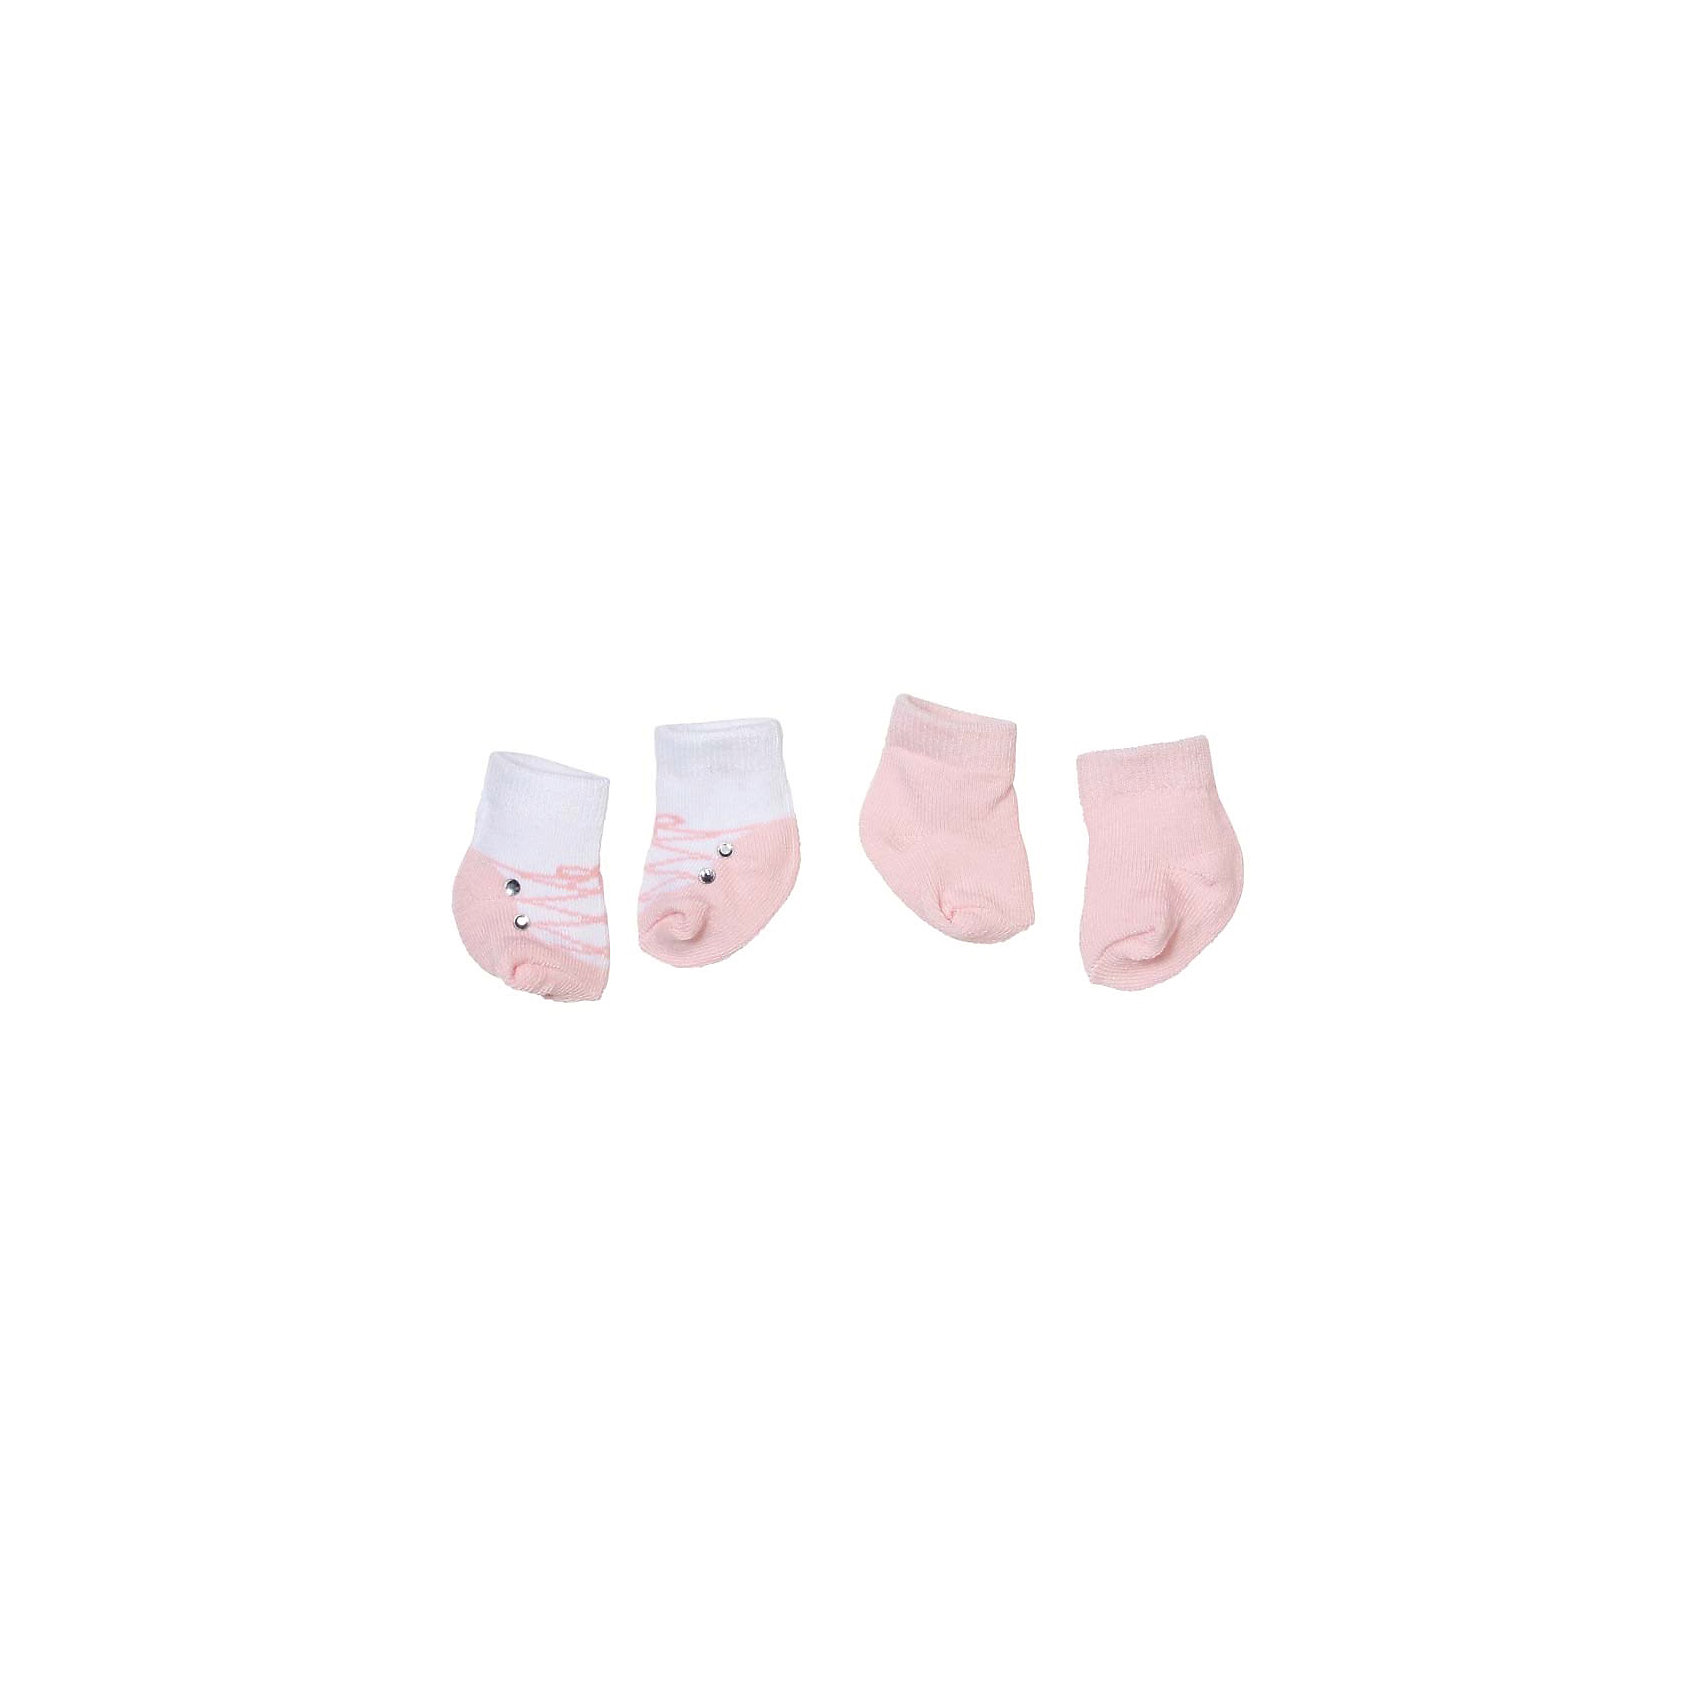 Zapf Creation Носочки 2 пары, розовые, Baby Annabell miacompany шерстяные носочки розовые